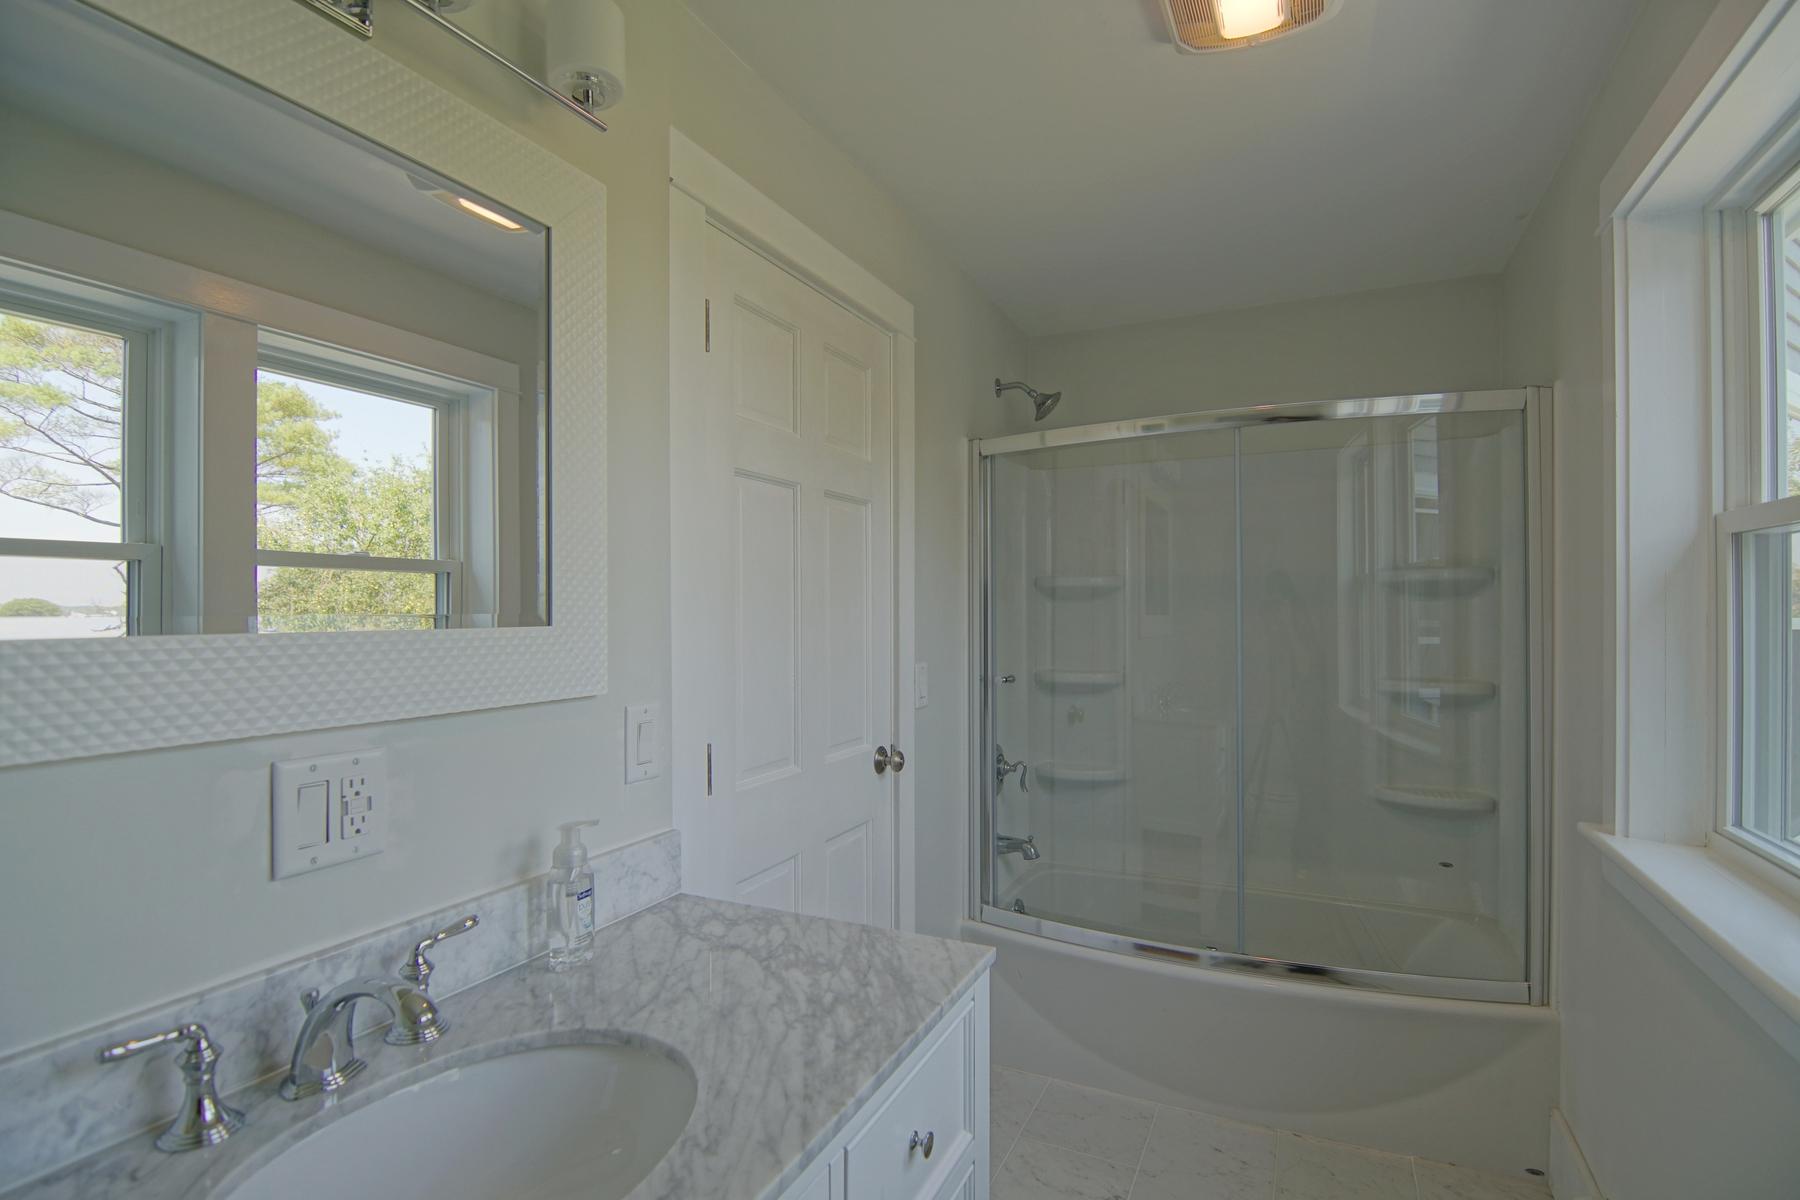 Additional photo for property listing at 10 Wildwood Lane, Rye NH 03870  Rye, New Hampshire 03870 United States